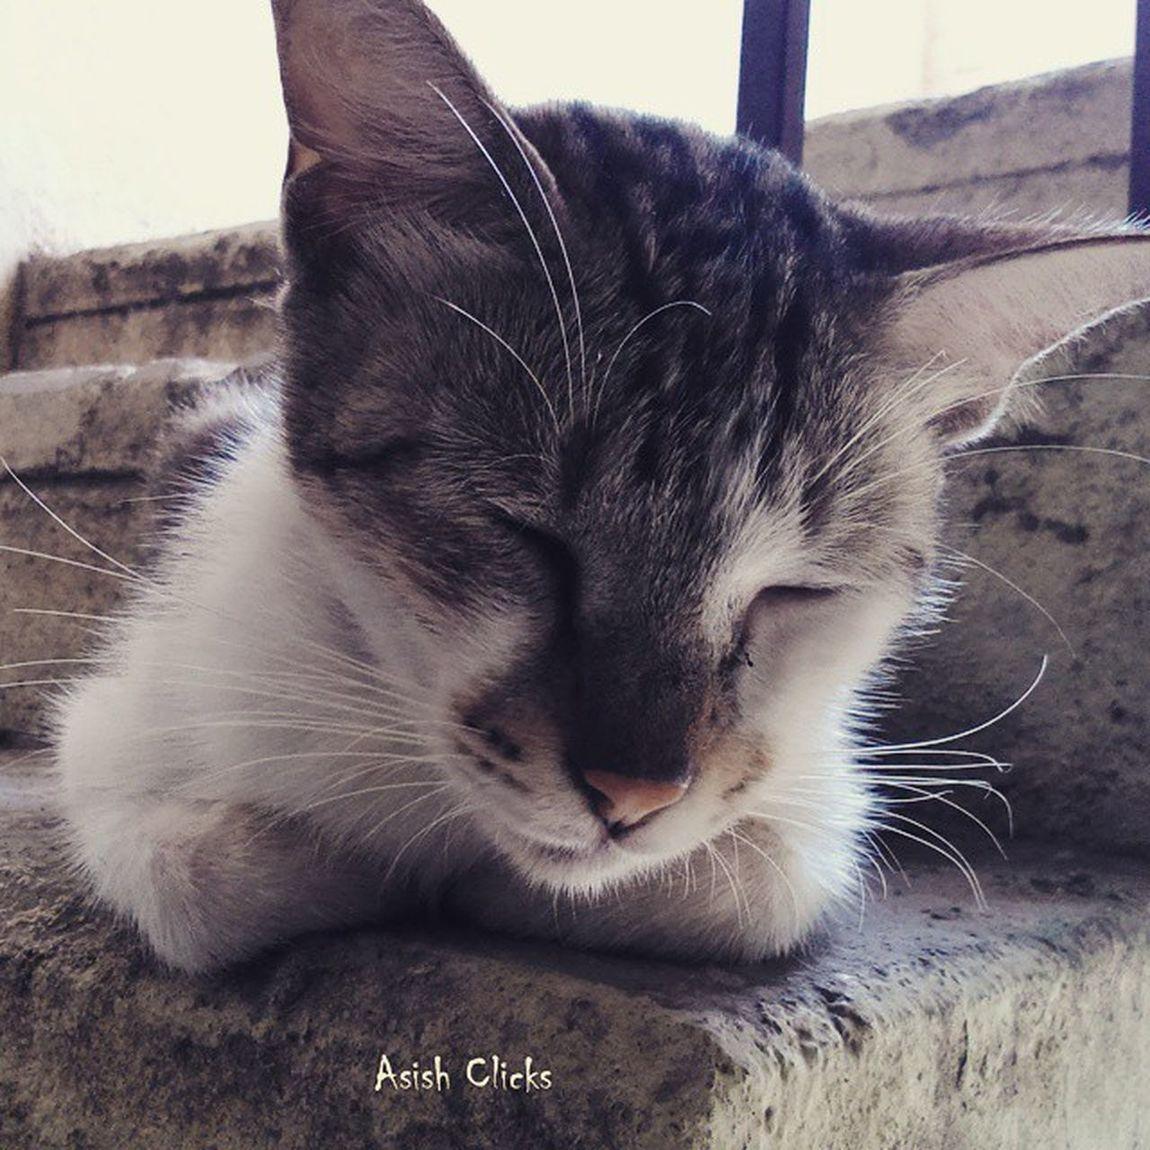 Puchu - my cat :) Cat Pet Love Cute Lovable Animals Peta Thepound Bluecross Cats Cutiepie Adorable Asishclicks